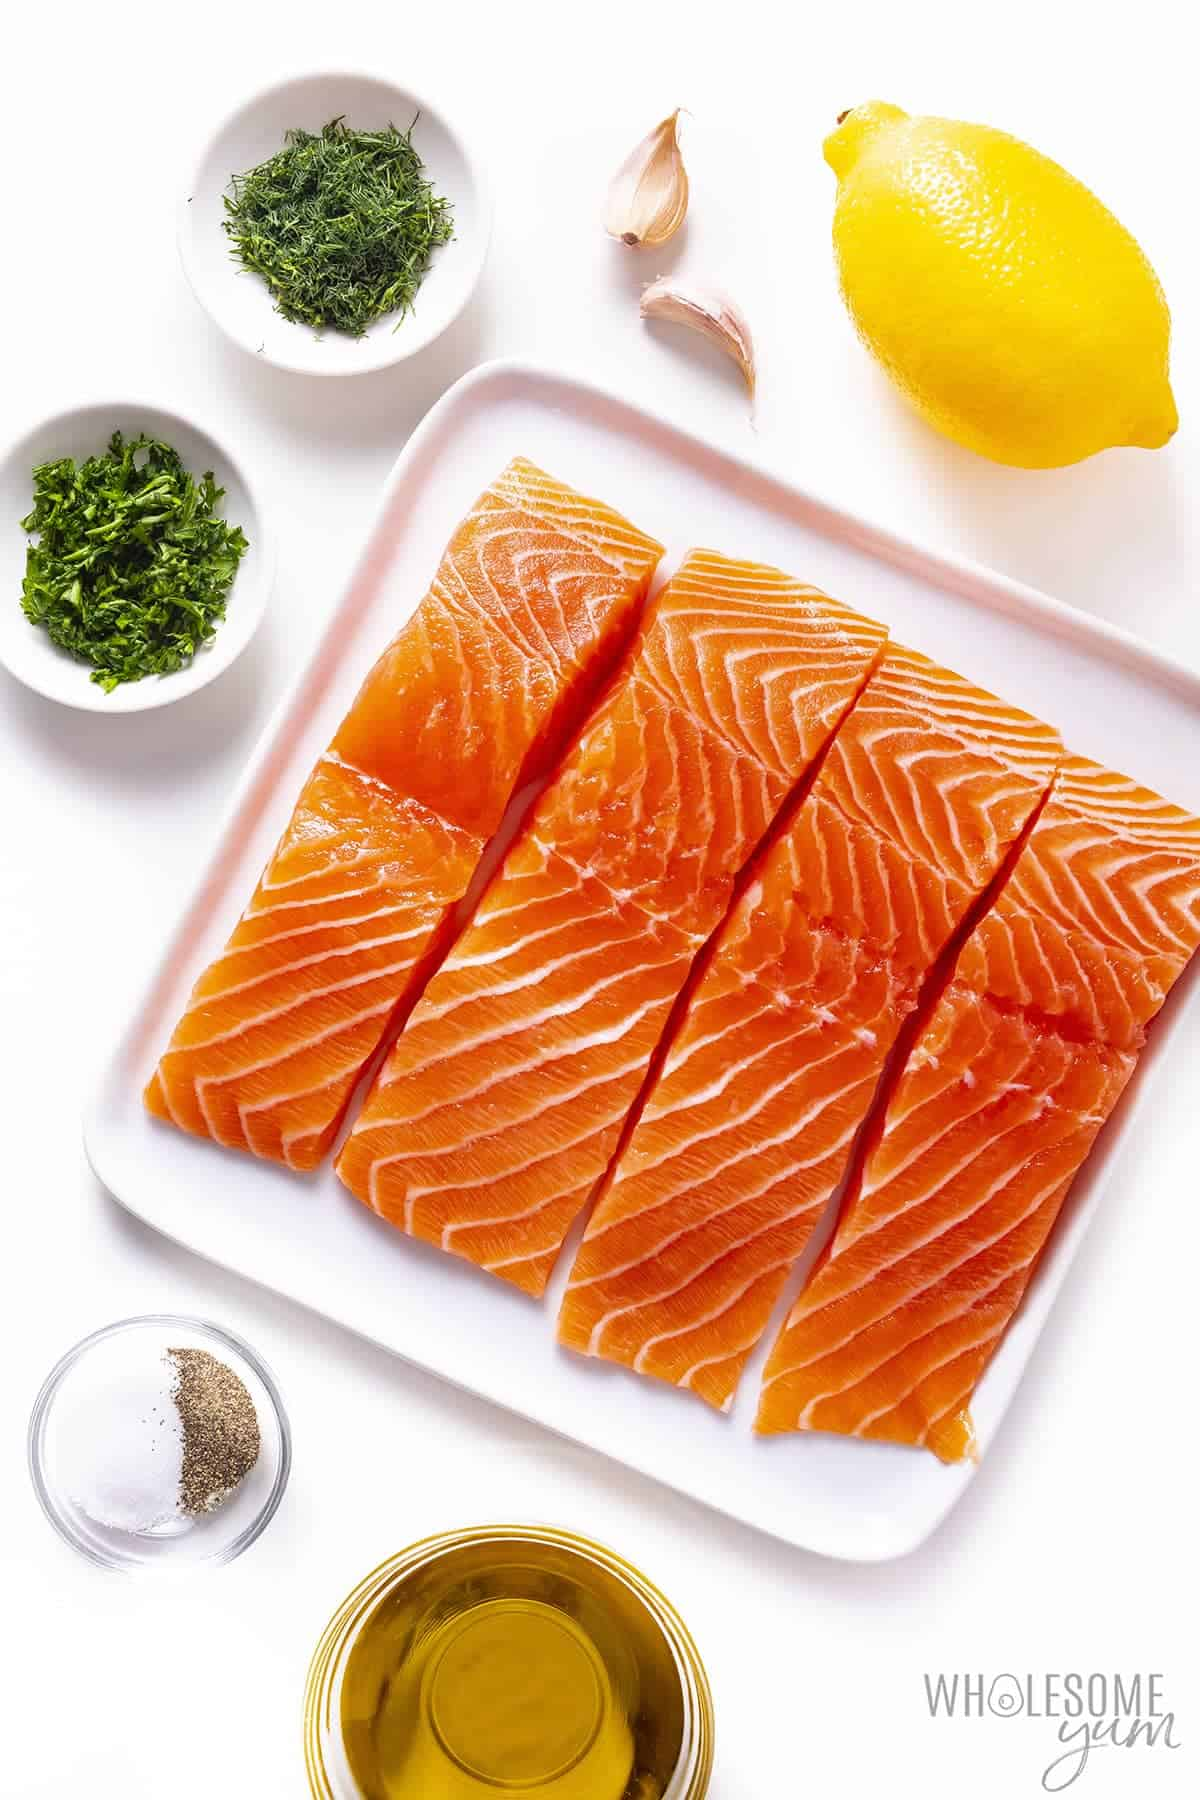 Ingredients to make best baked salmon recipe